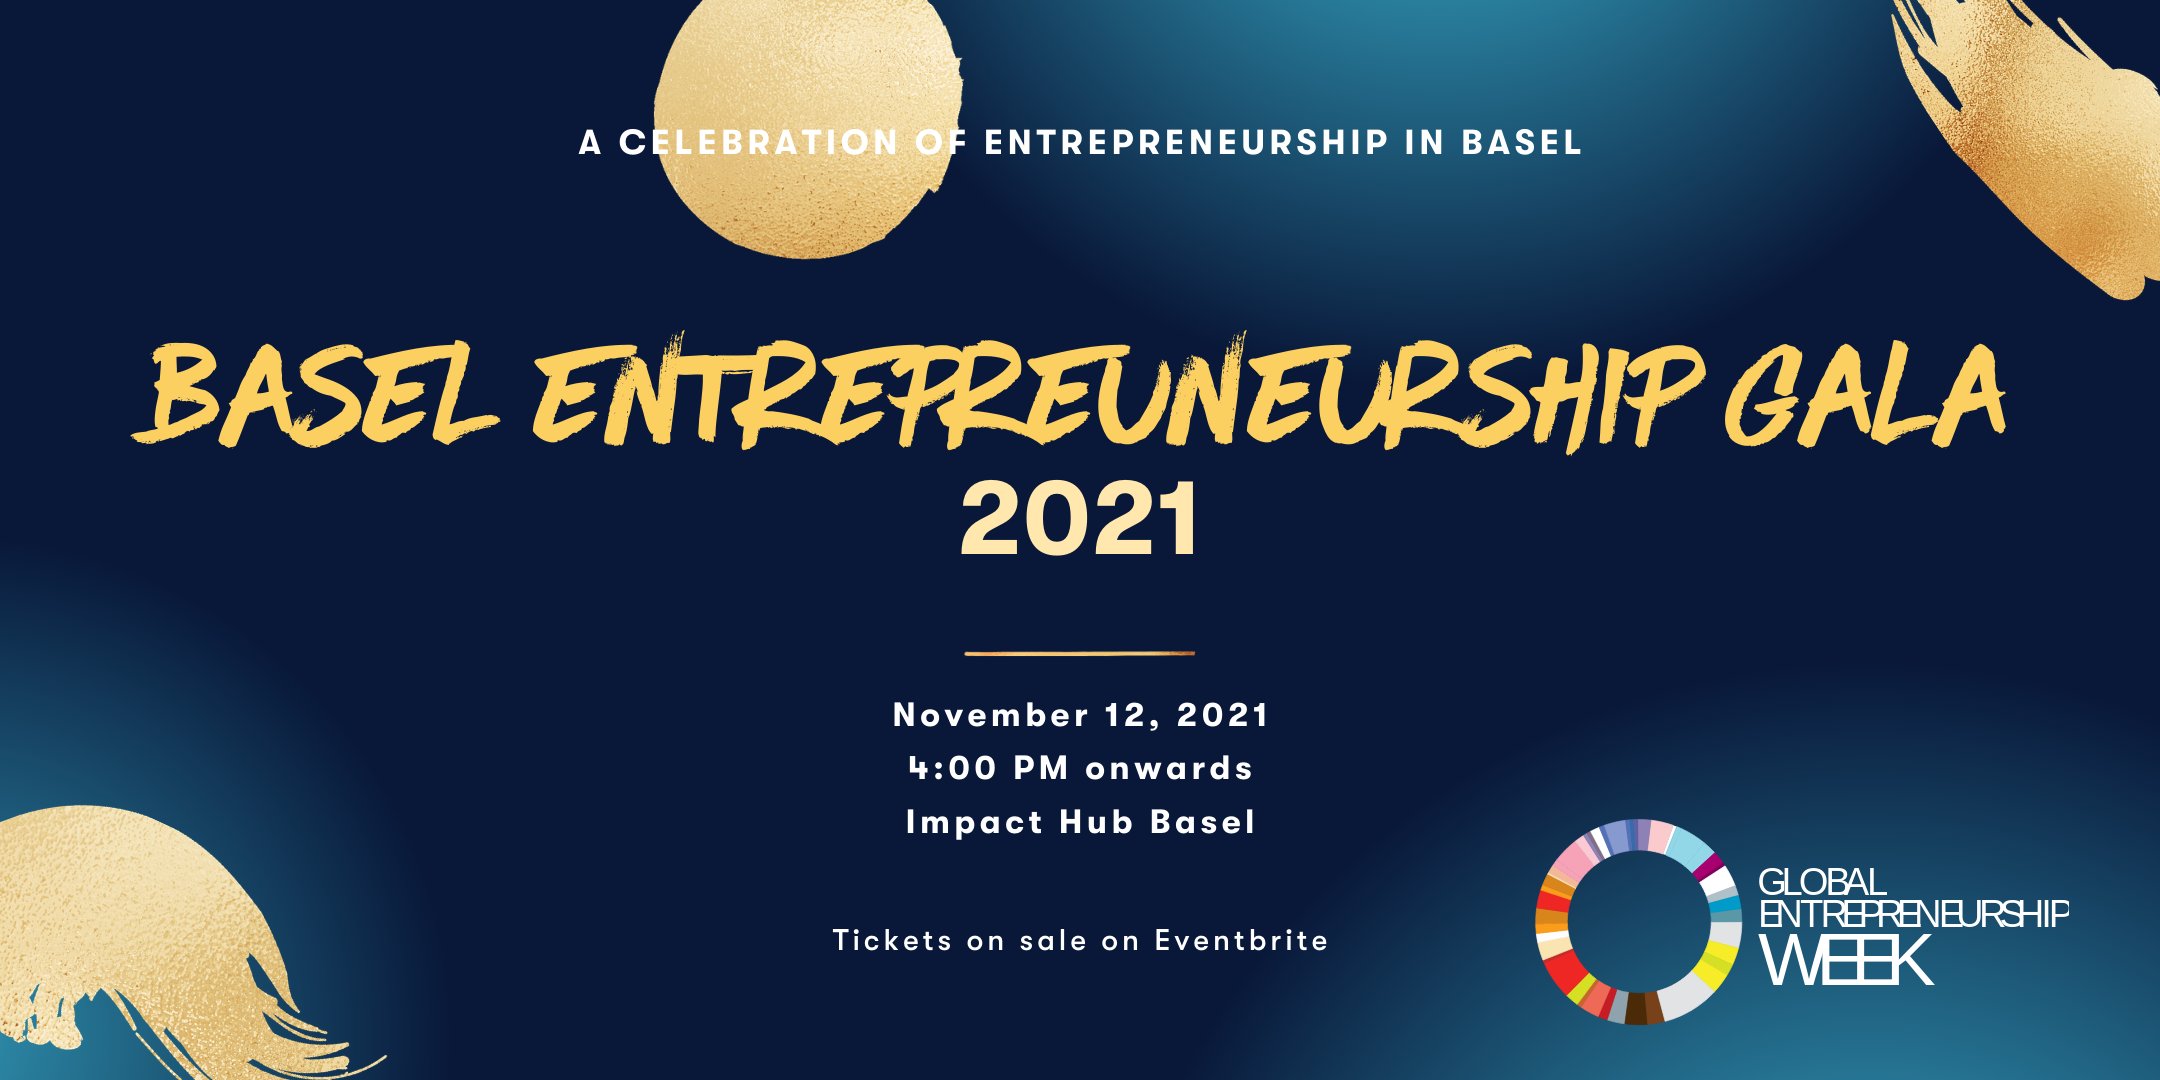 Basel Entrepreneurship Gala 2021